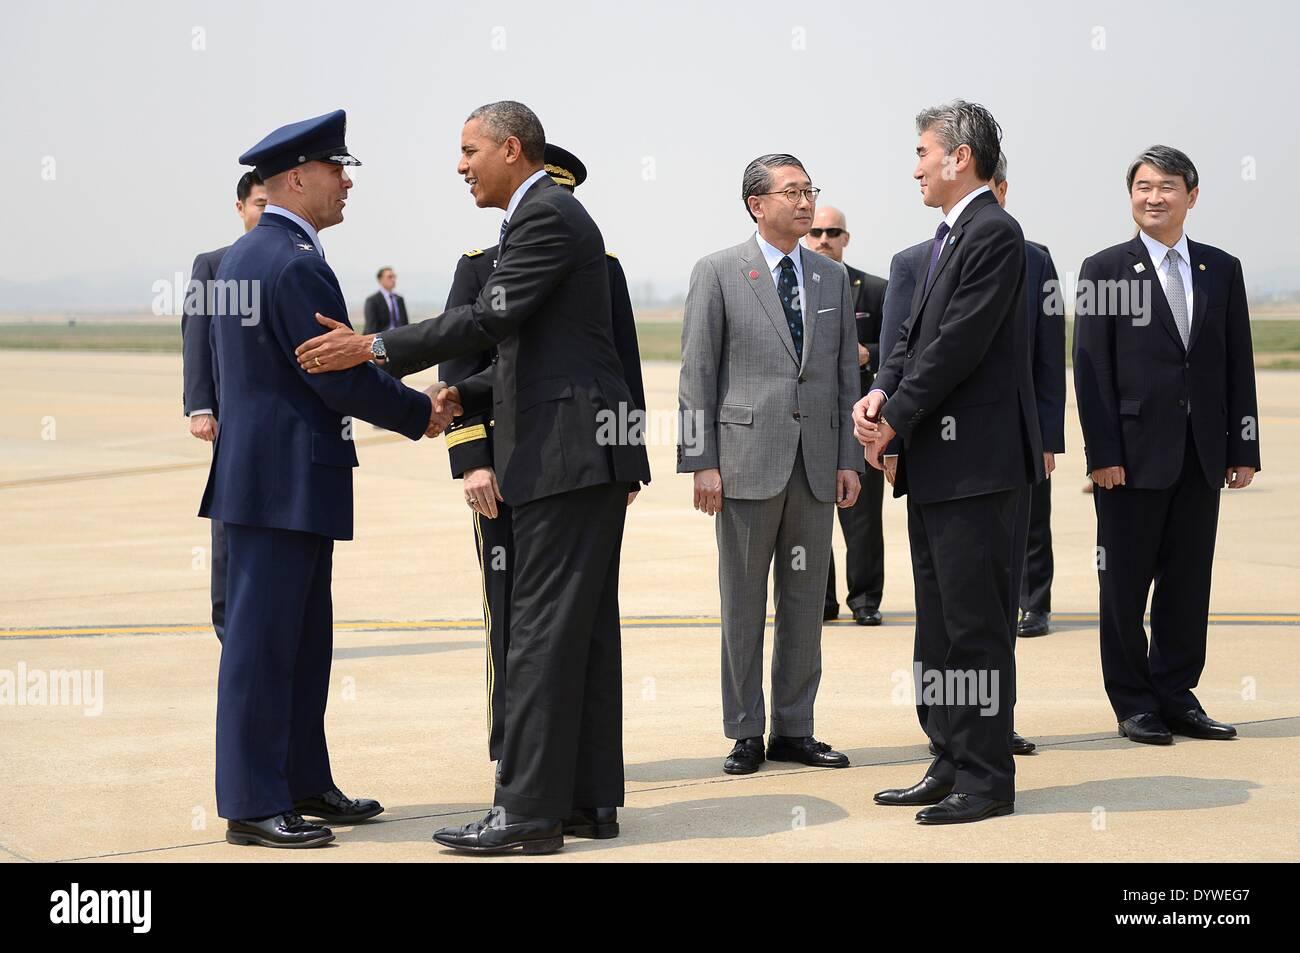 US President Barack Obama greets Col. Brook Leonard, 51st Fighter Wing commander, upon his arrival at Osan Air Base - Stock Image